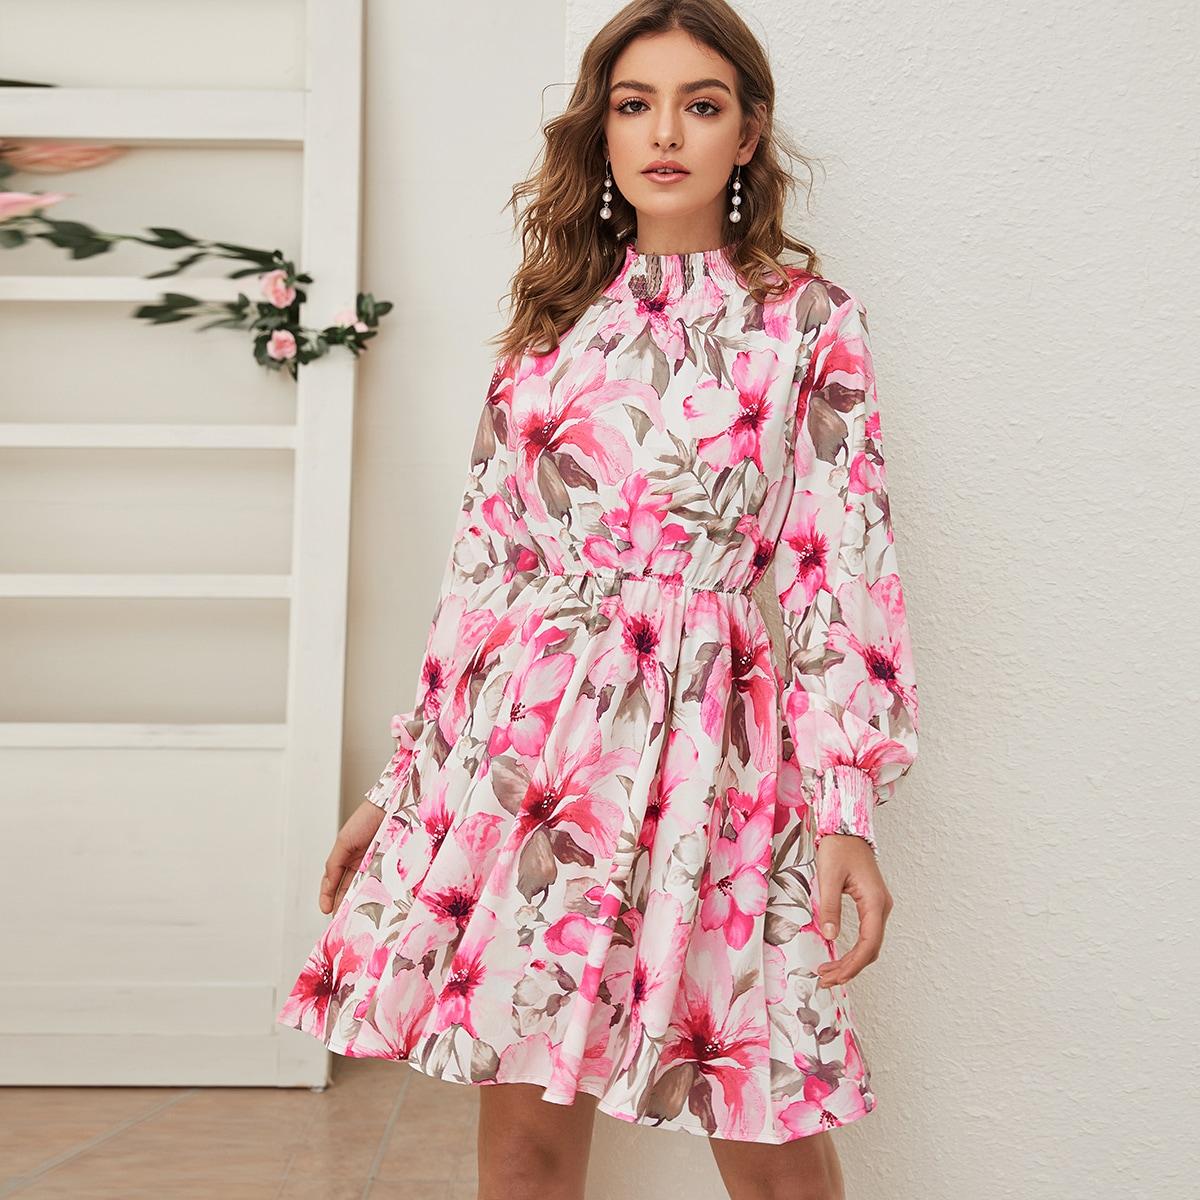 SHEIN / Floral Print Shirred Collar High Waist Dress